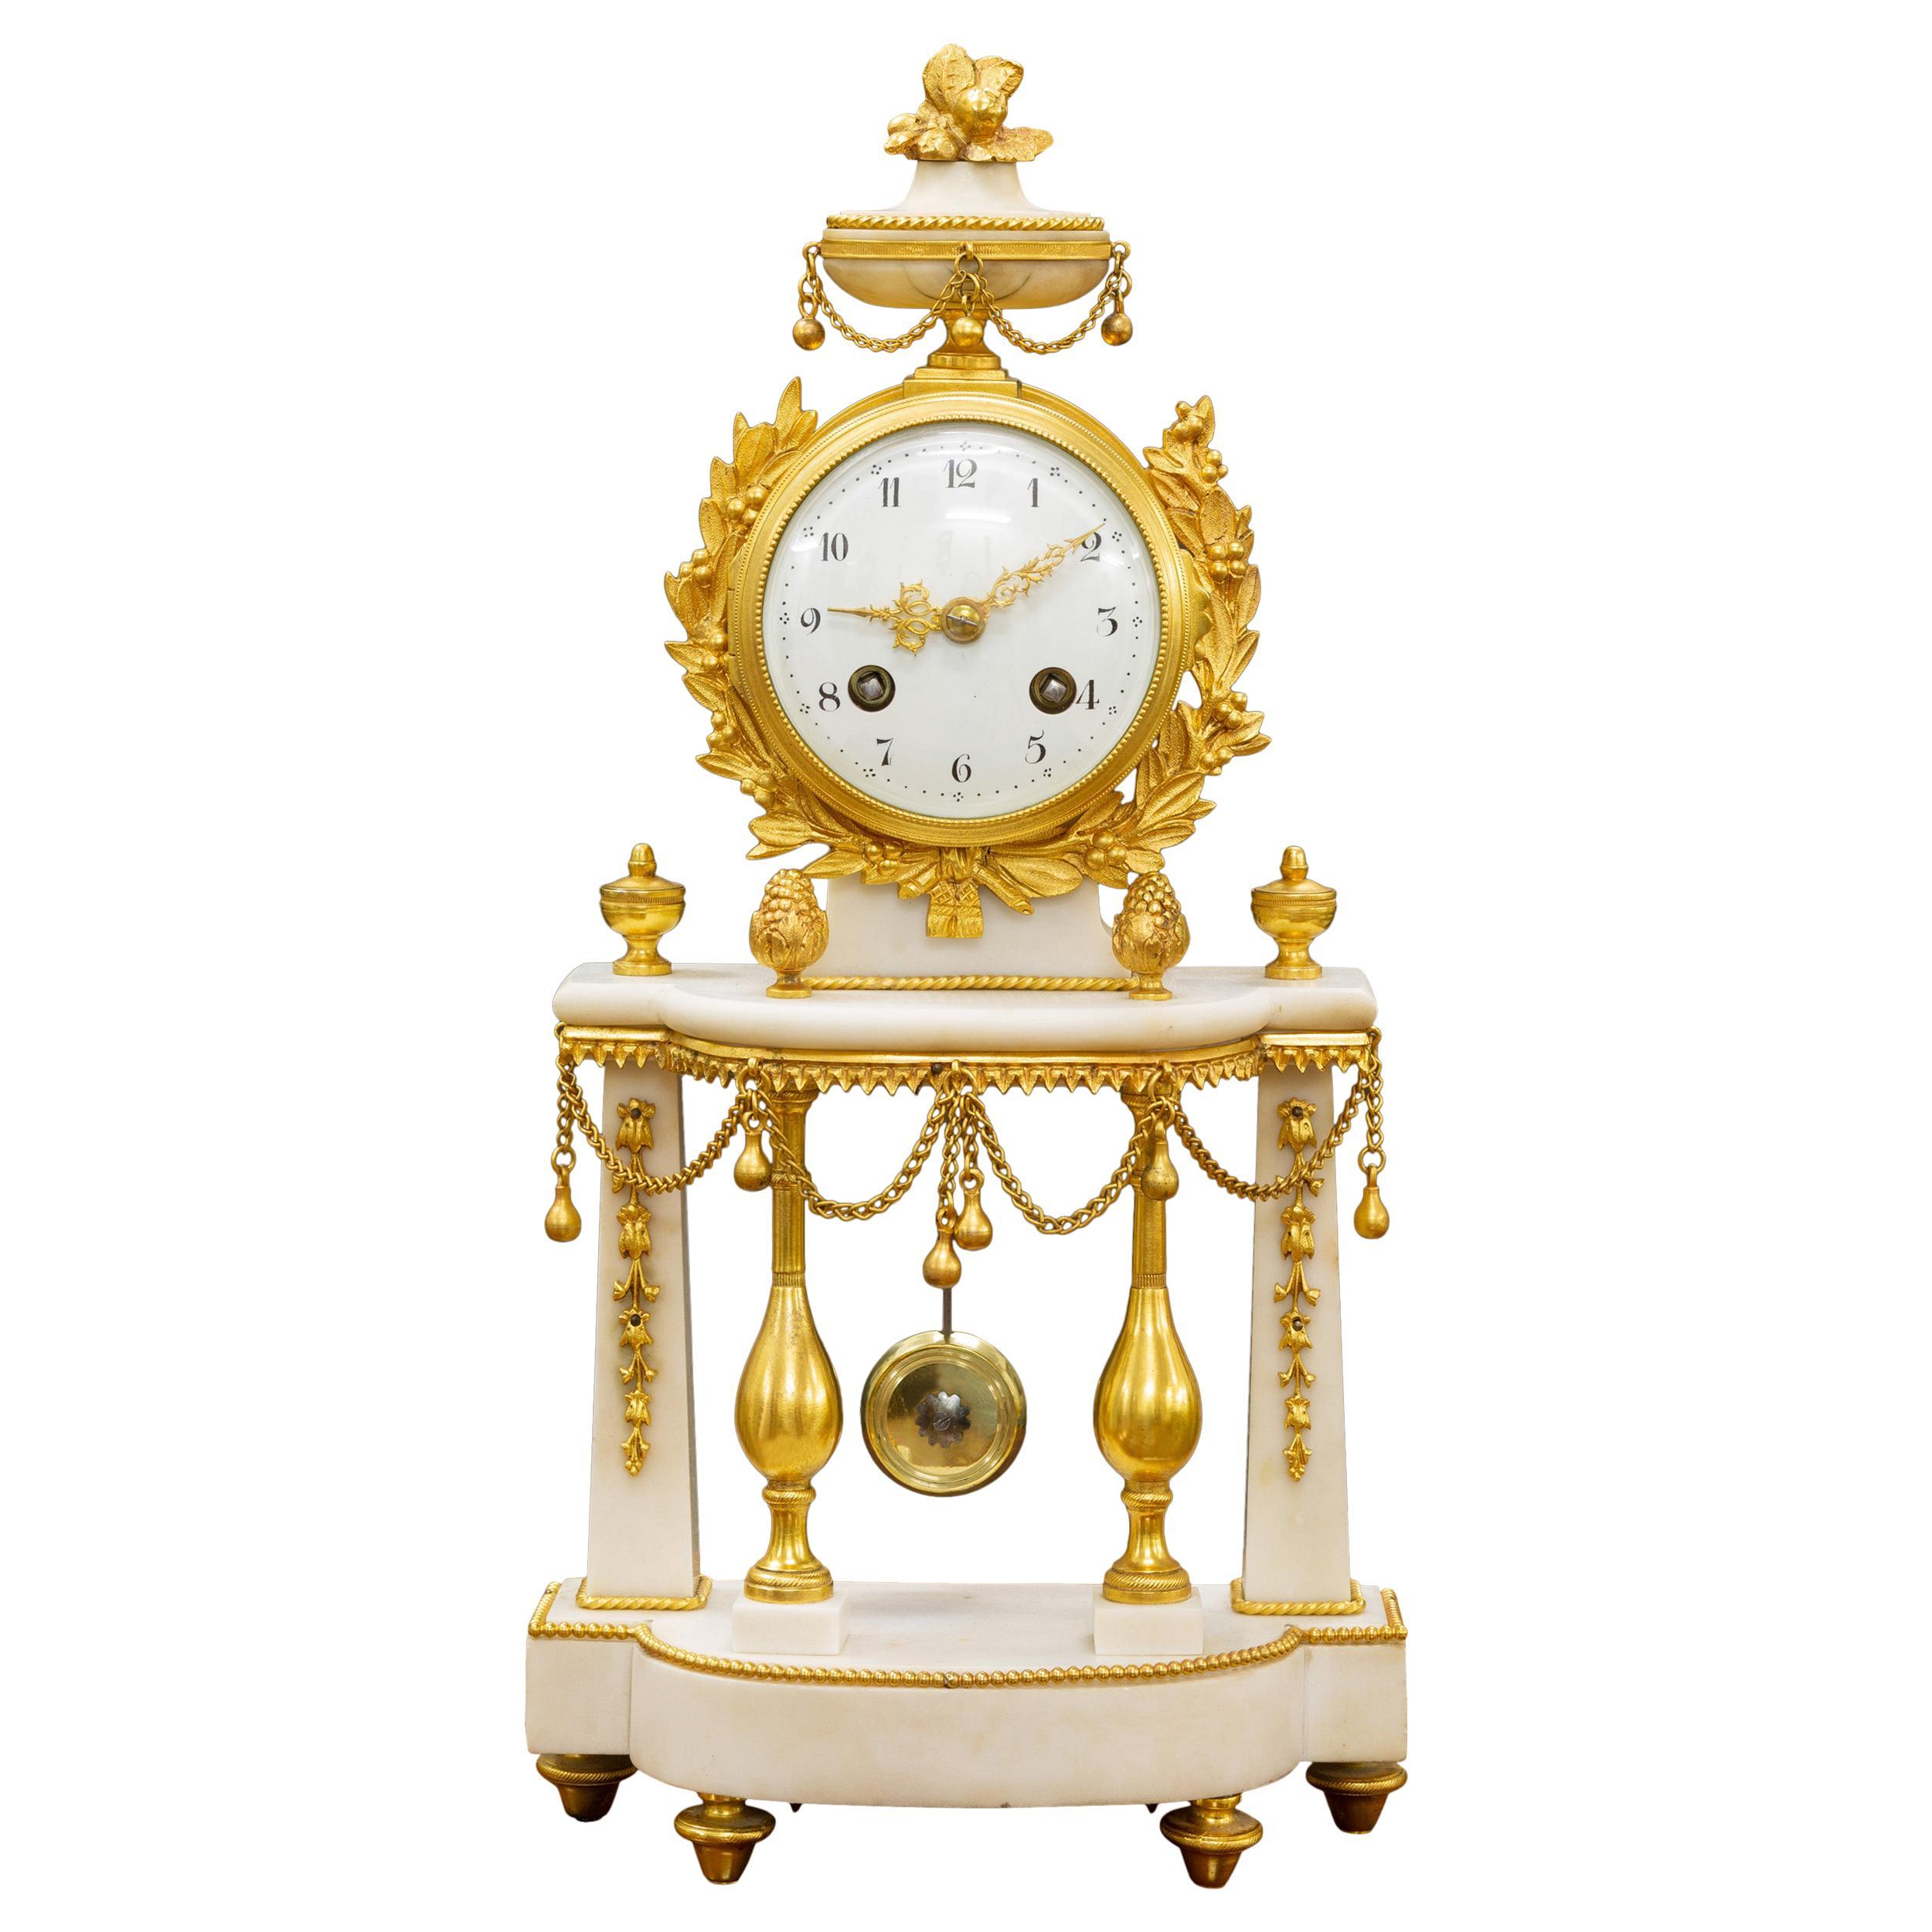 French White Marble and Ormolu Pillar Mantel Clock